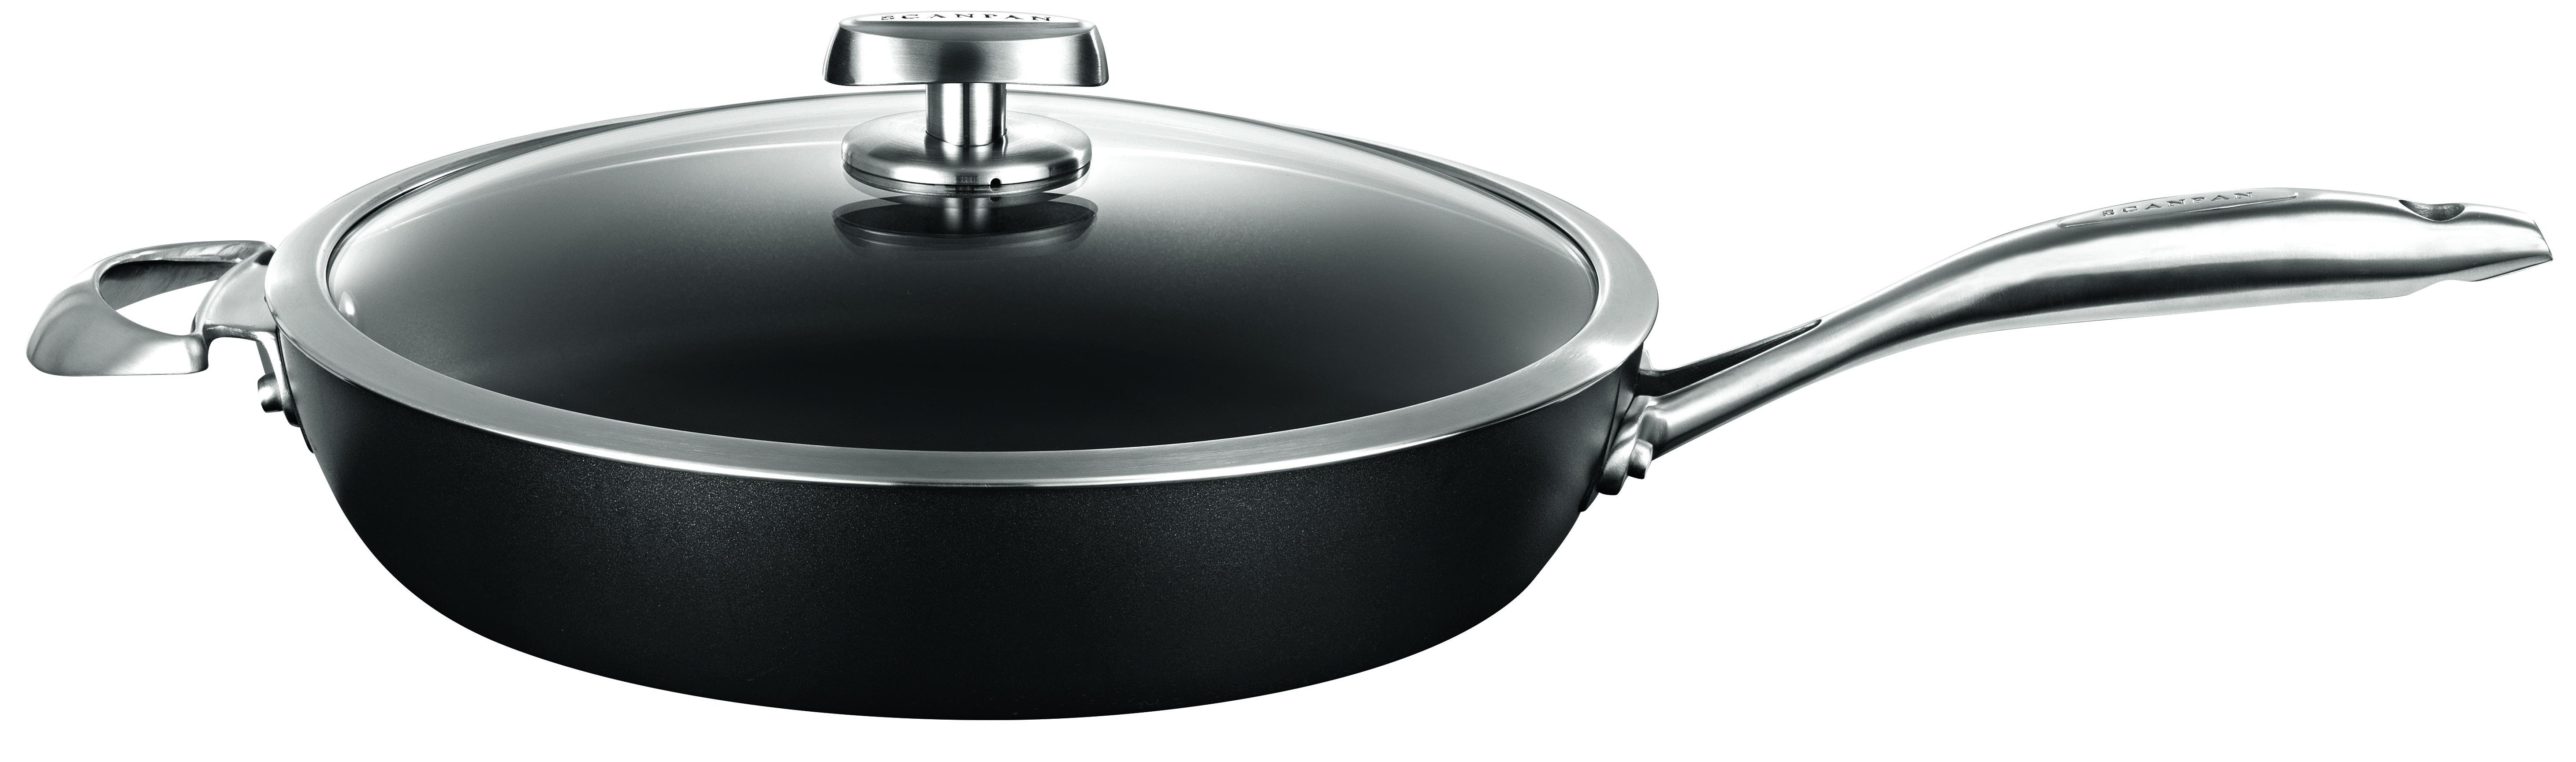 32cmCov. SautéPan-Pro IQ, 3.6L 32cm